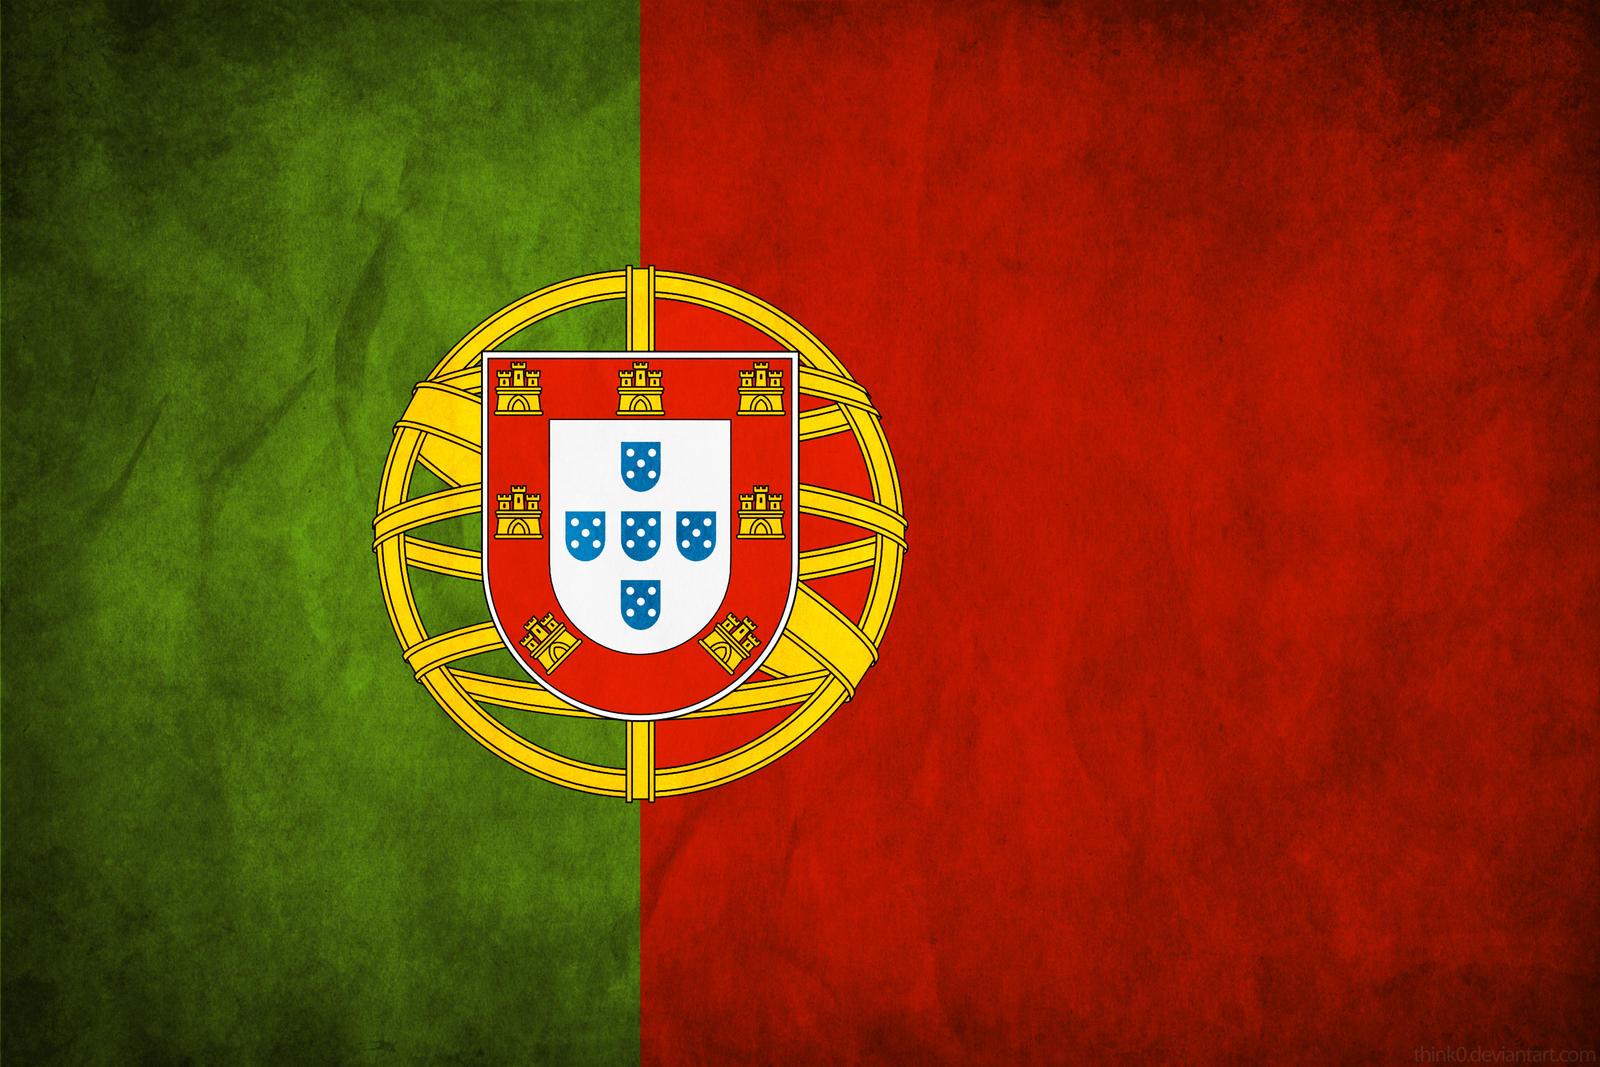 Portugal Grunge Flag by think0 on DeviantArt